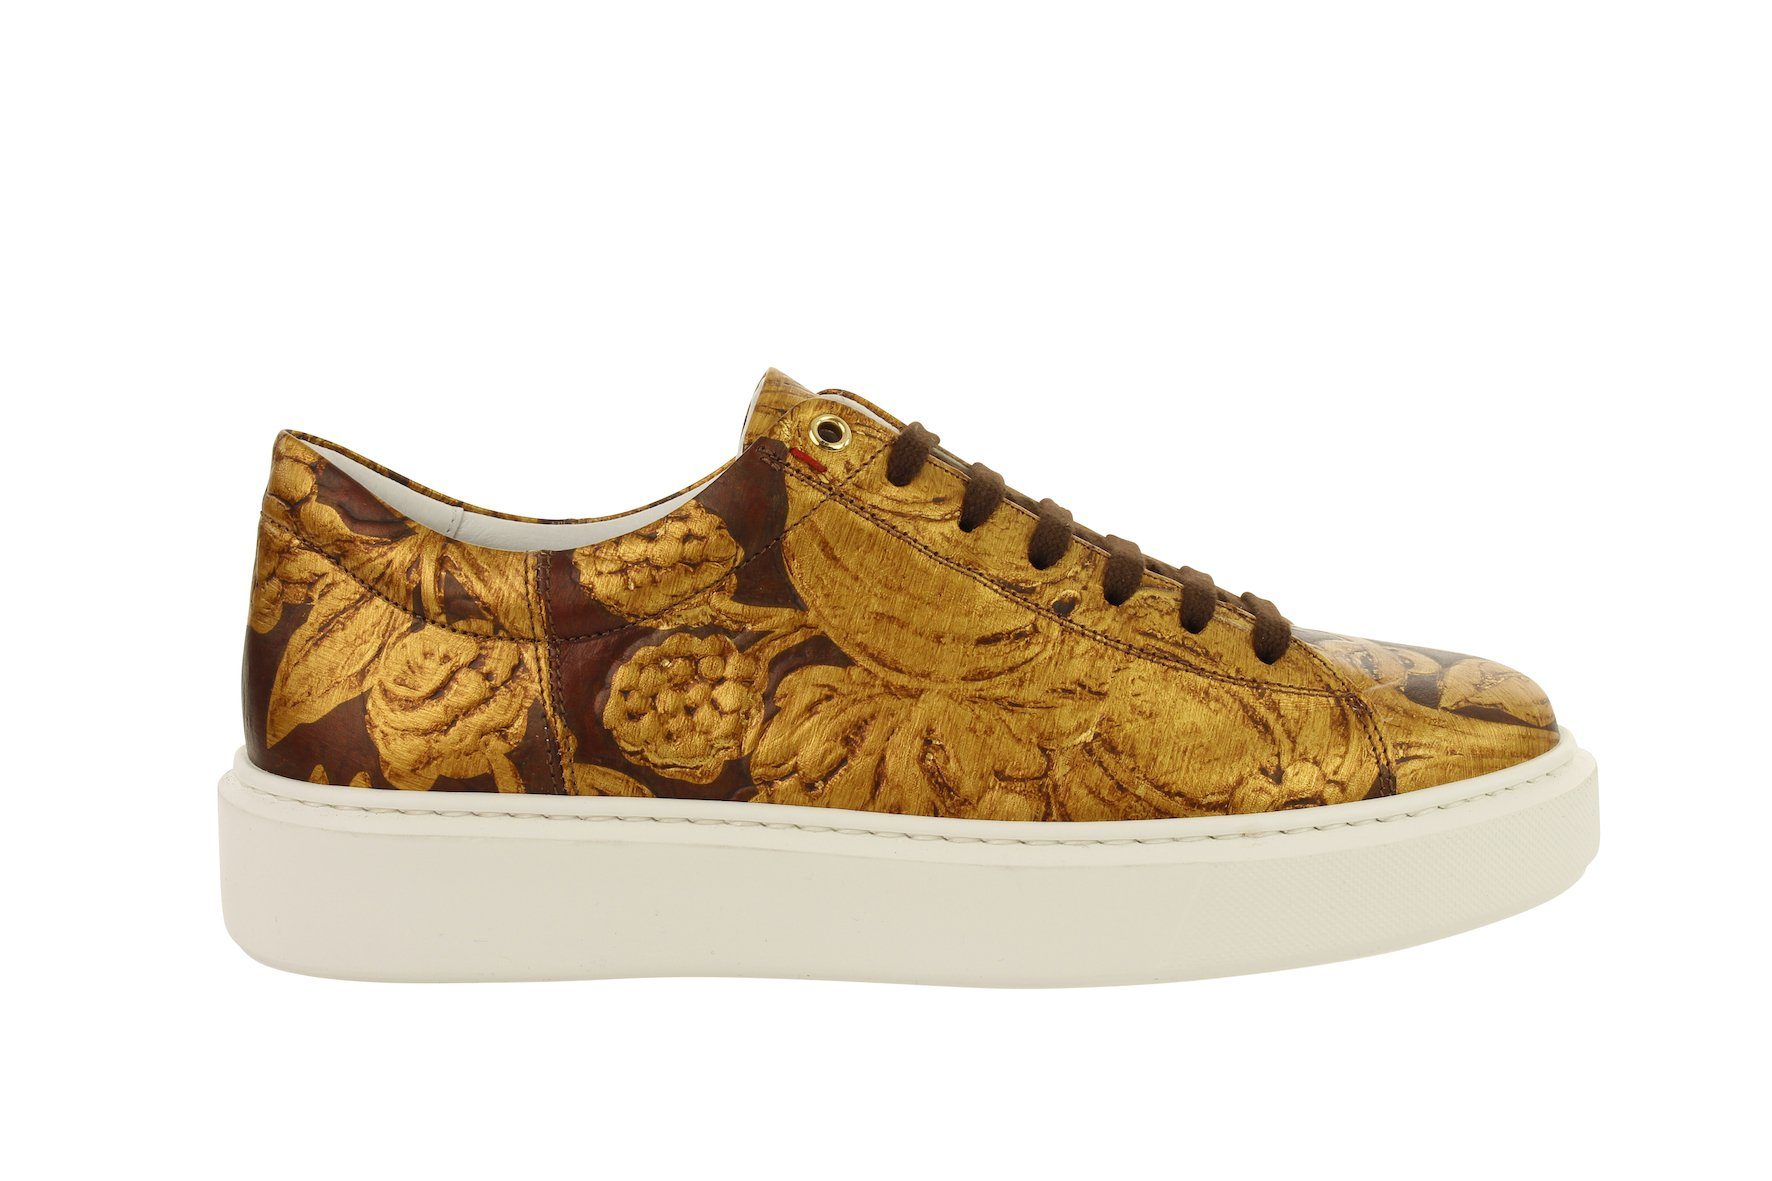 Falco sneaker Gold leather van Soest from LINKKENS